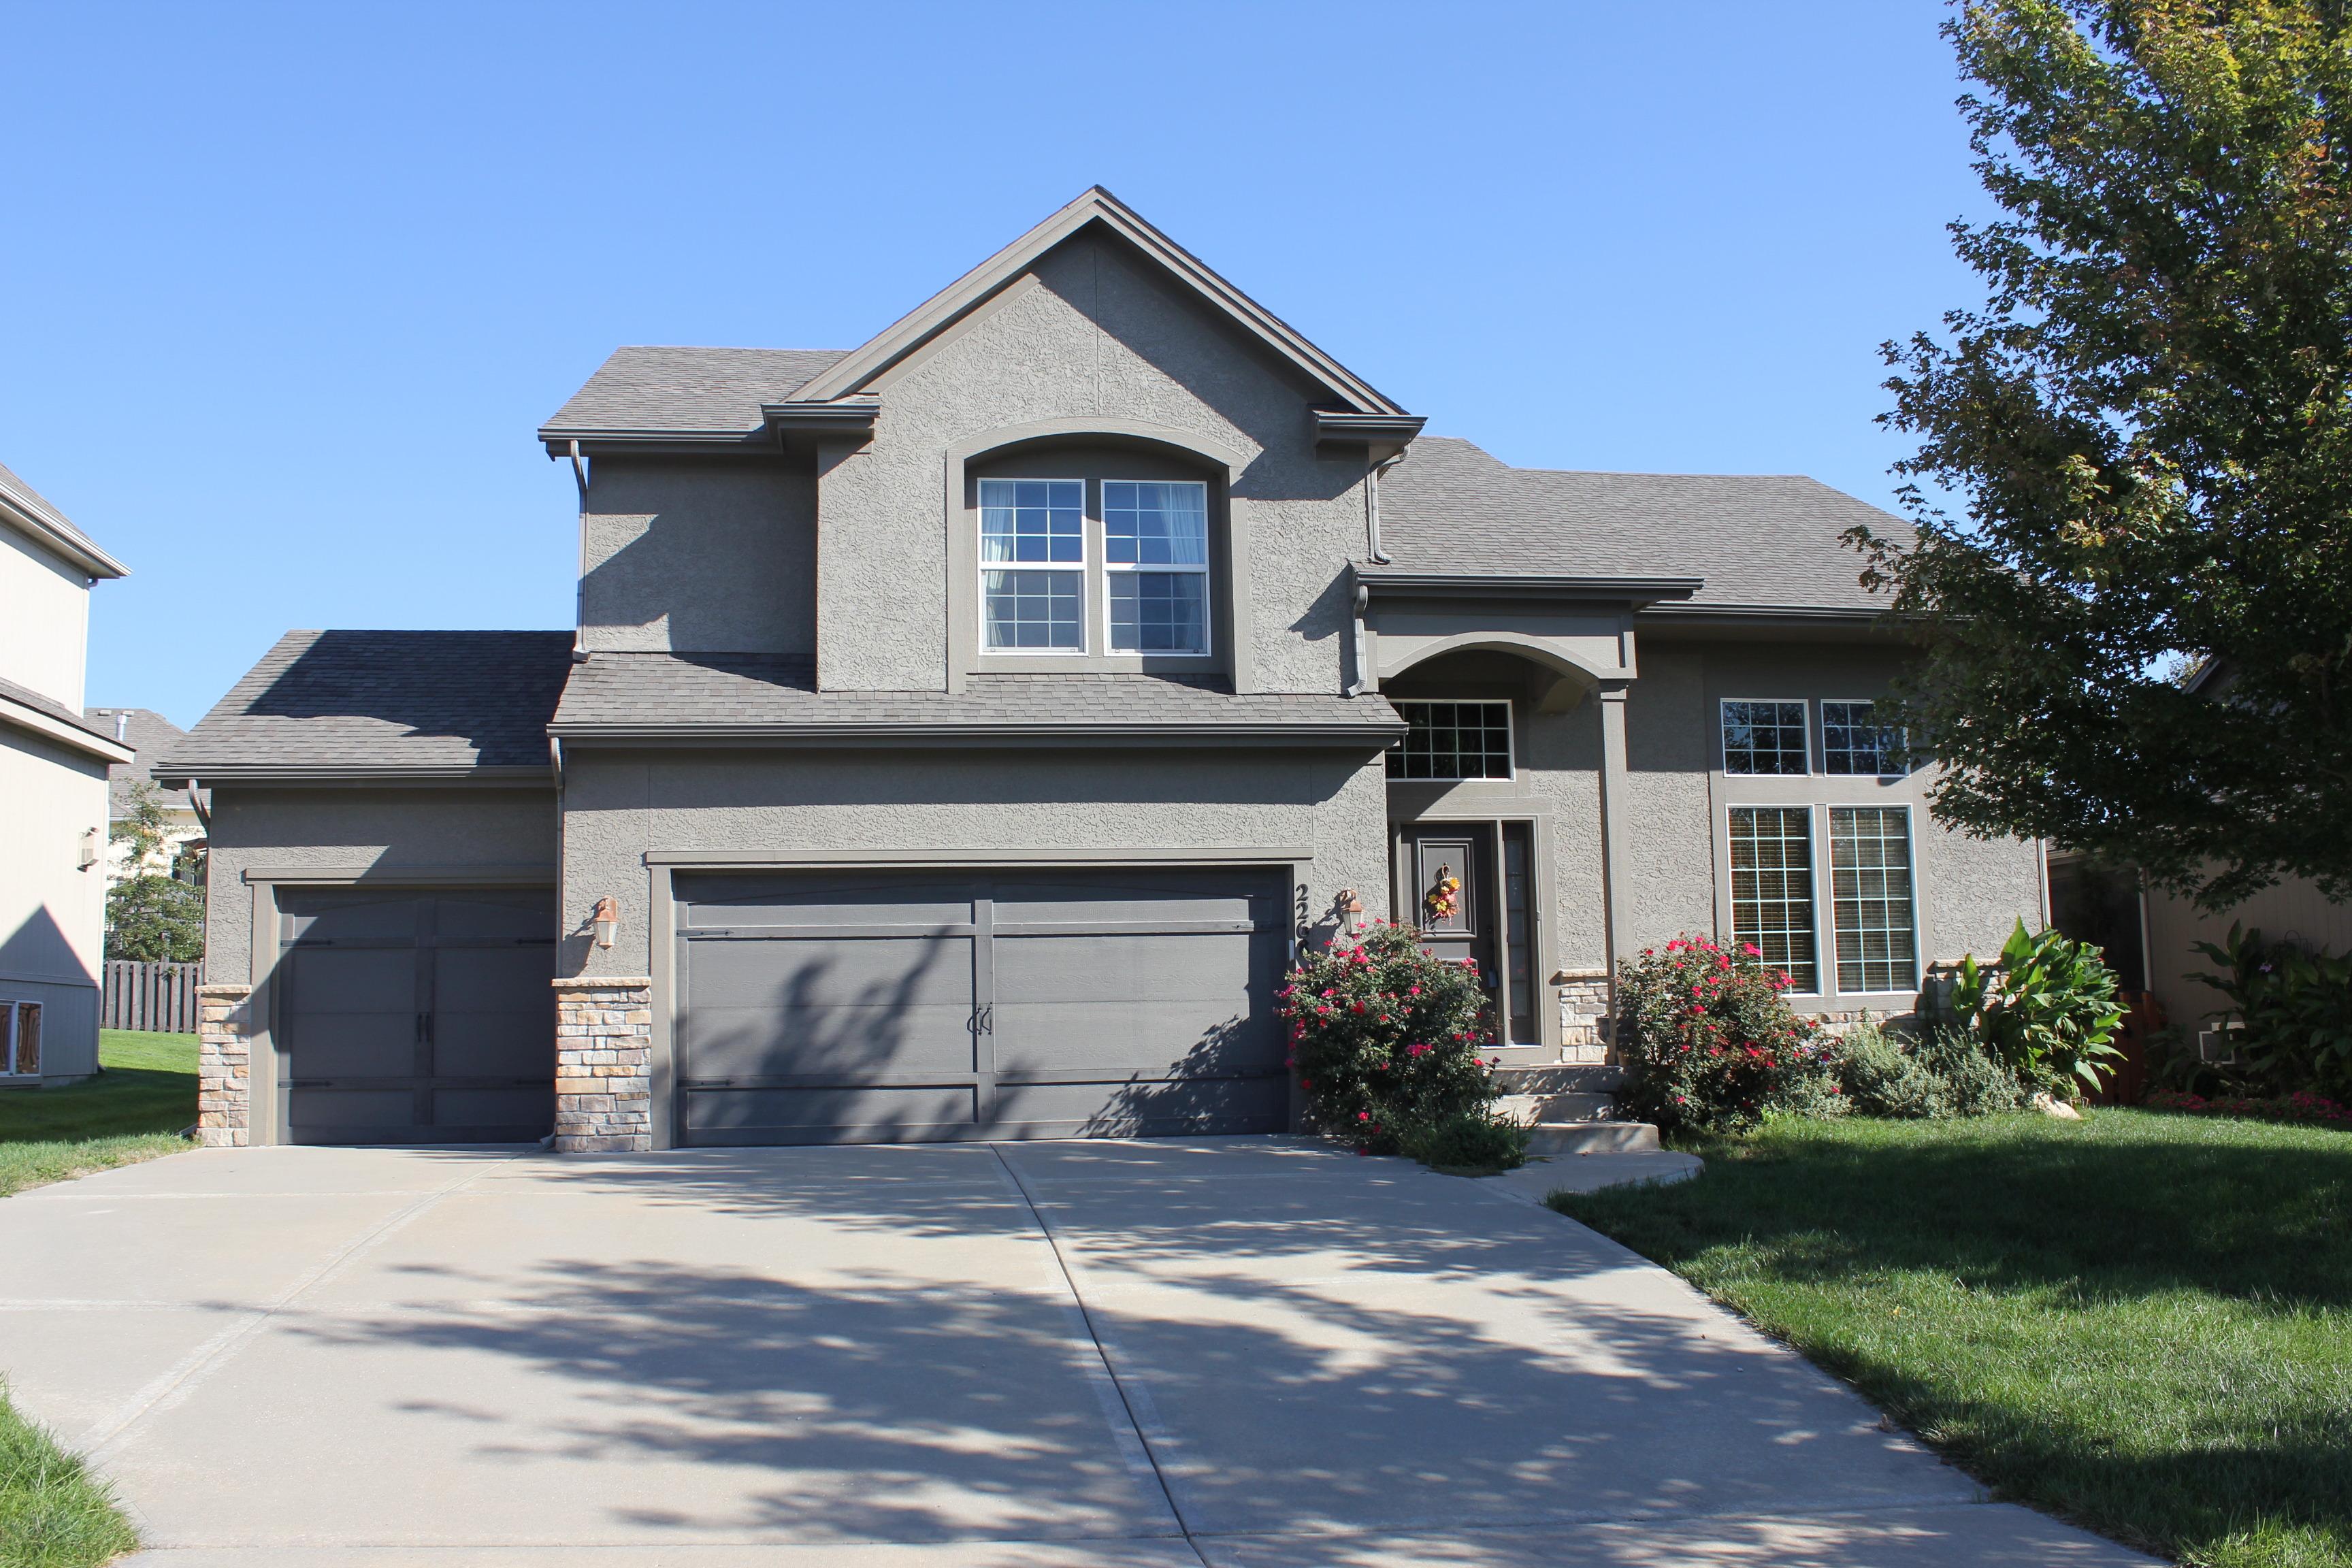 Briarwood Homes For Sale Olathe Ks